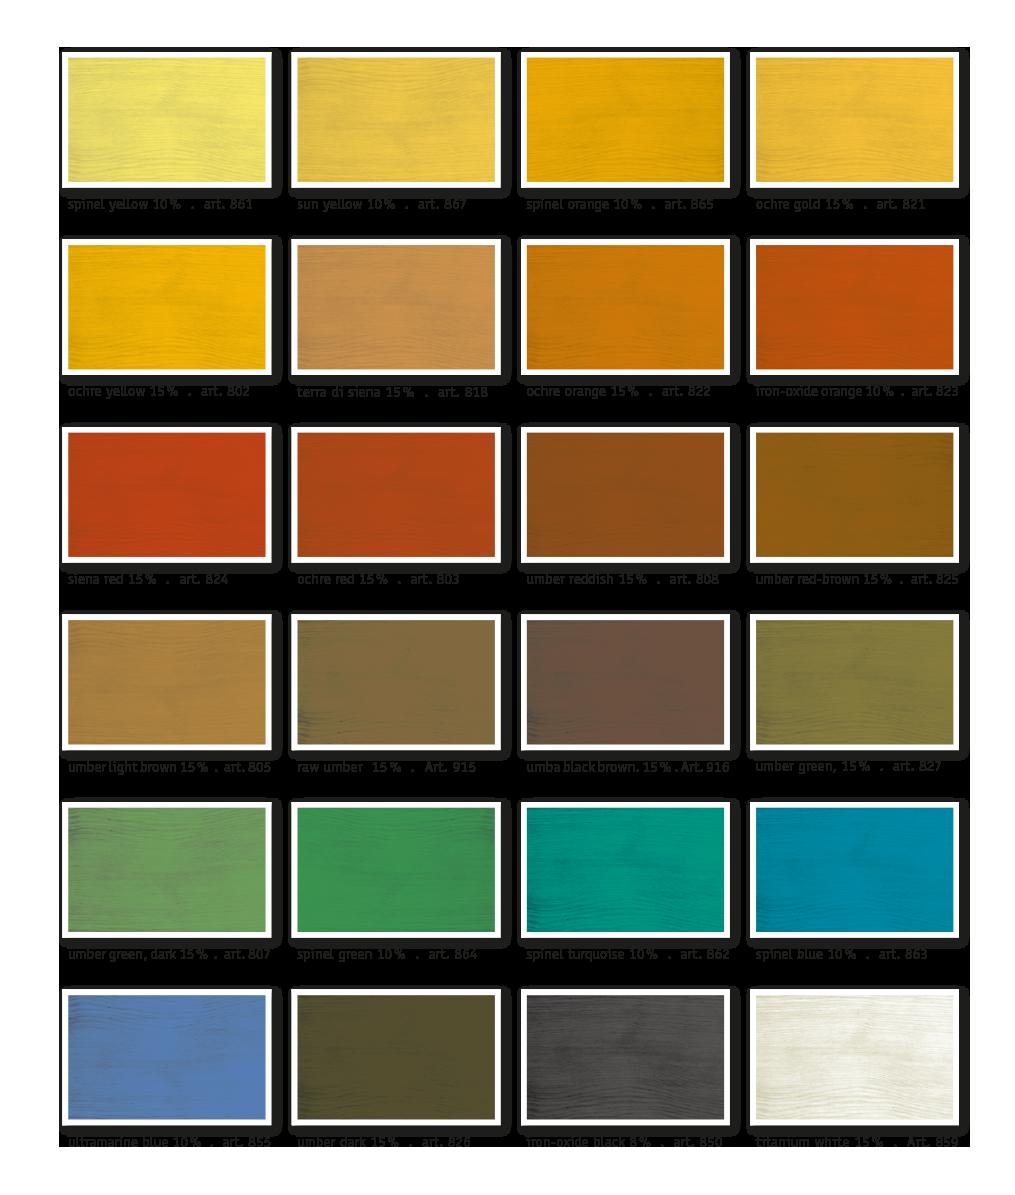 kreidezeit-naturfarben-colour-chart-pigments-in-oil